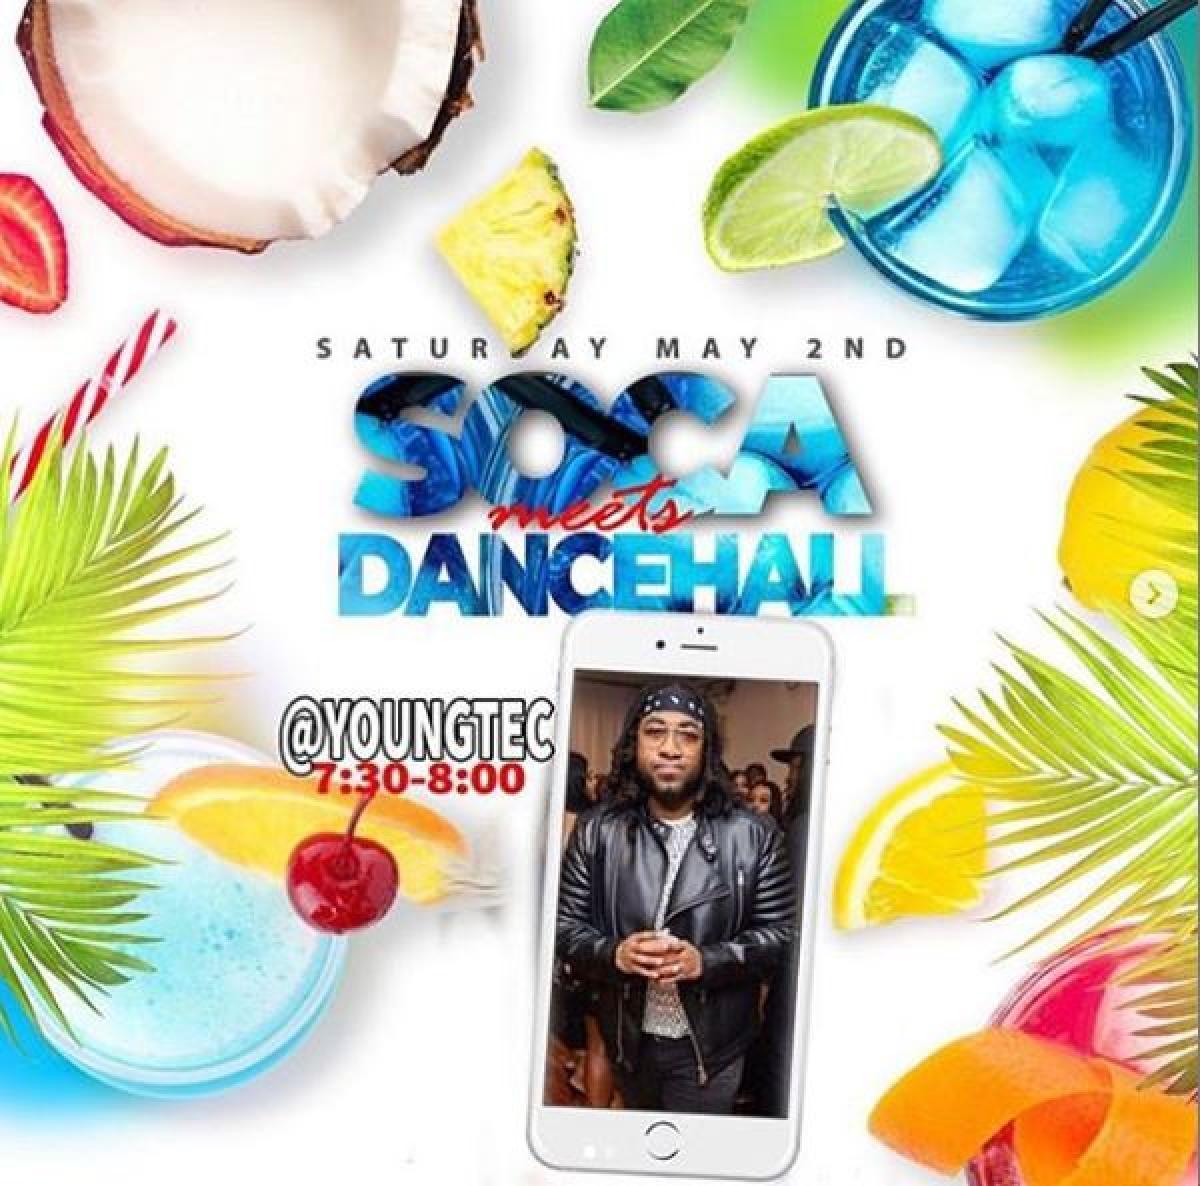 Soca Meets Dancehall flyer or graphic.